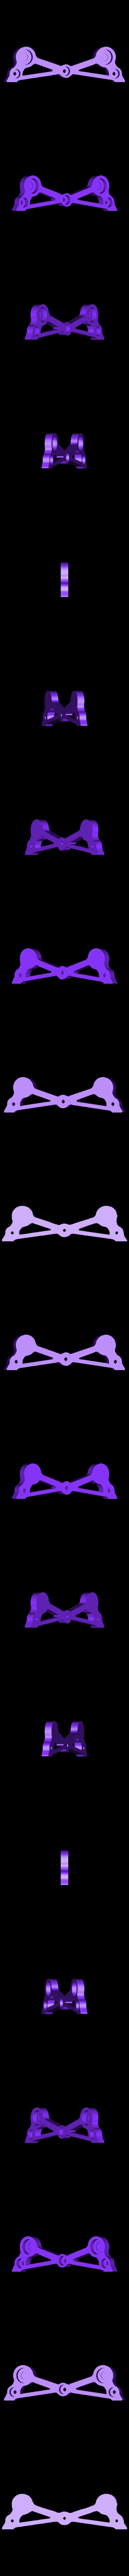 bearing_brecket.STL Télécharger fichier STL gratuit Gobelet rotatif • Plan à imprimer en 3D, perinski